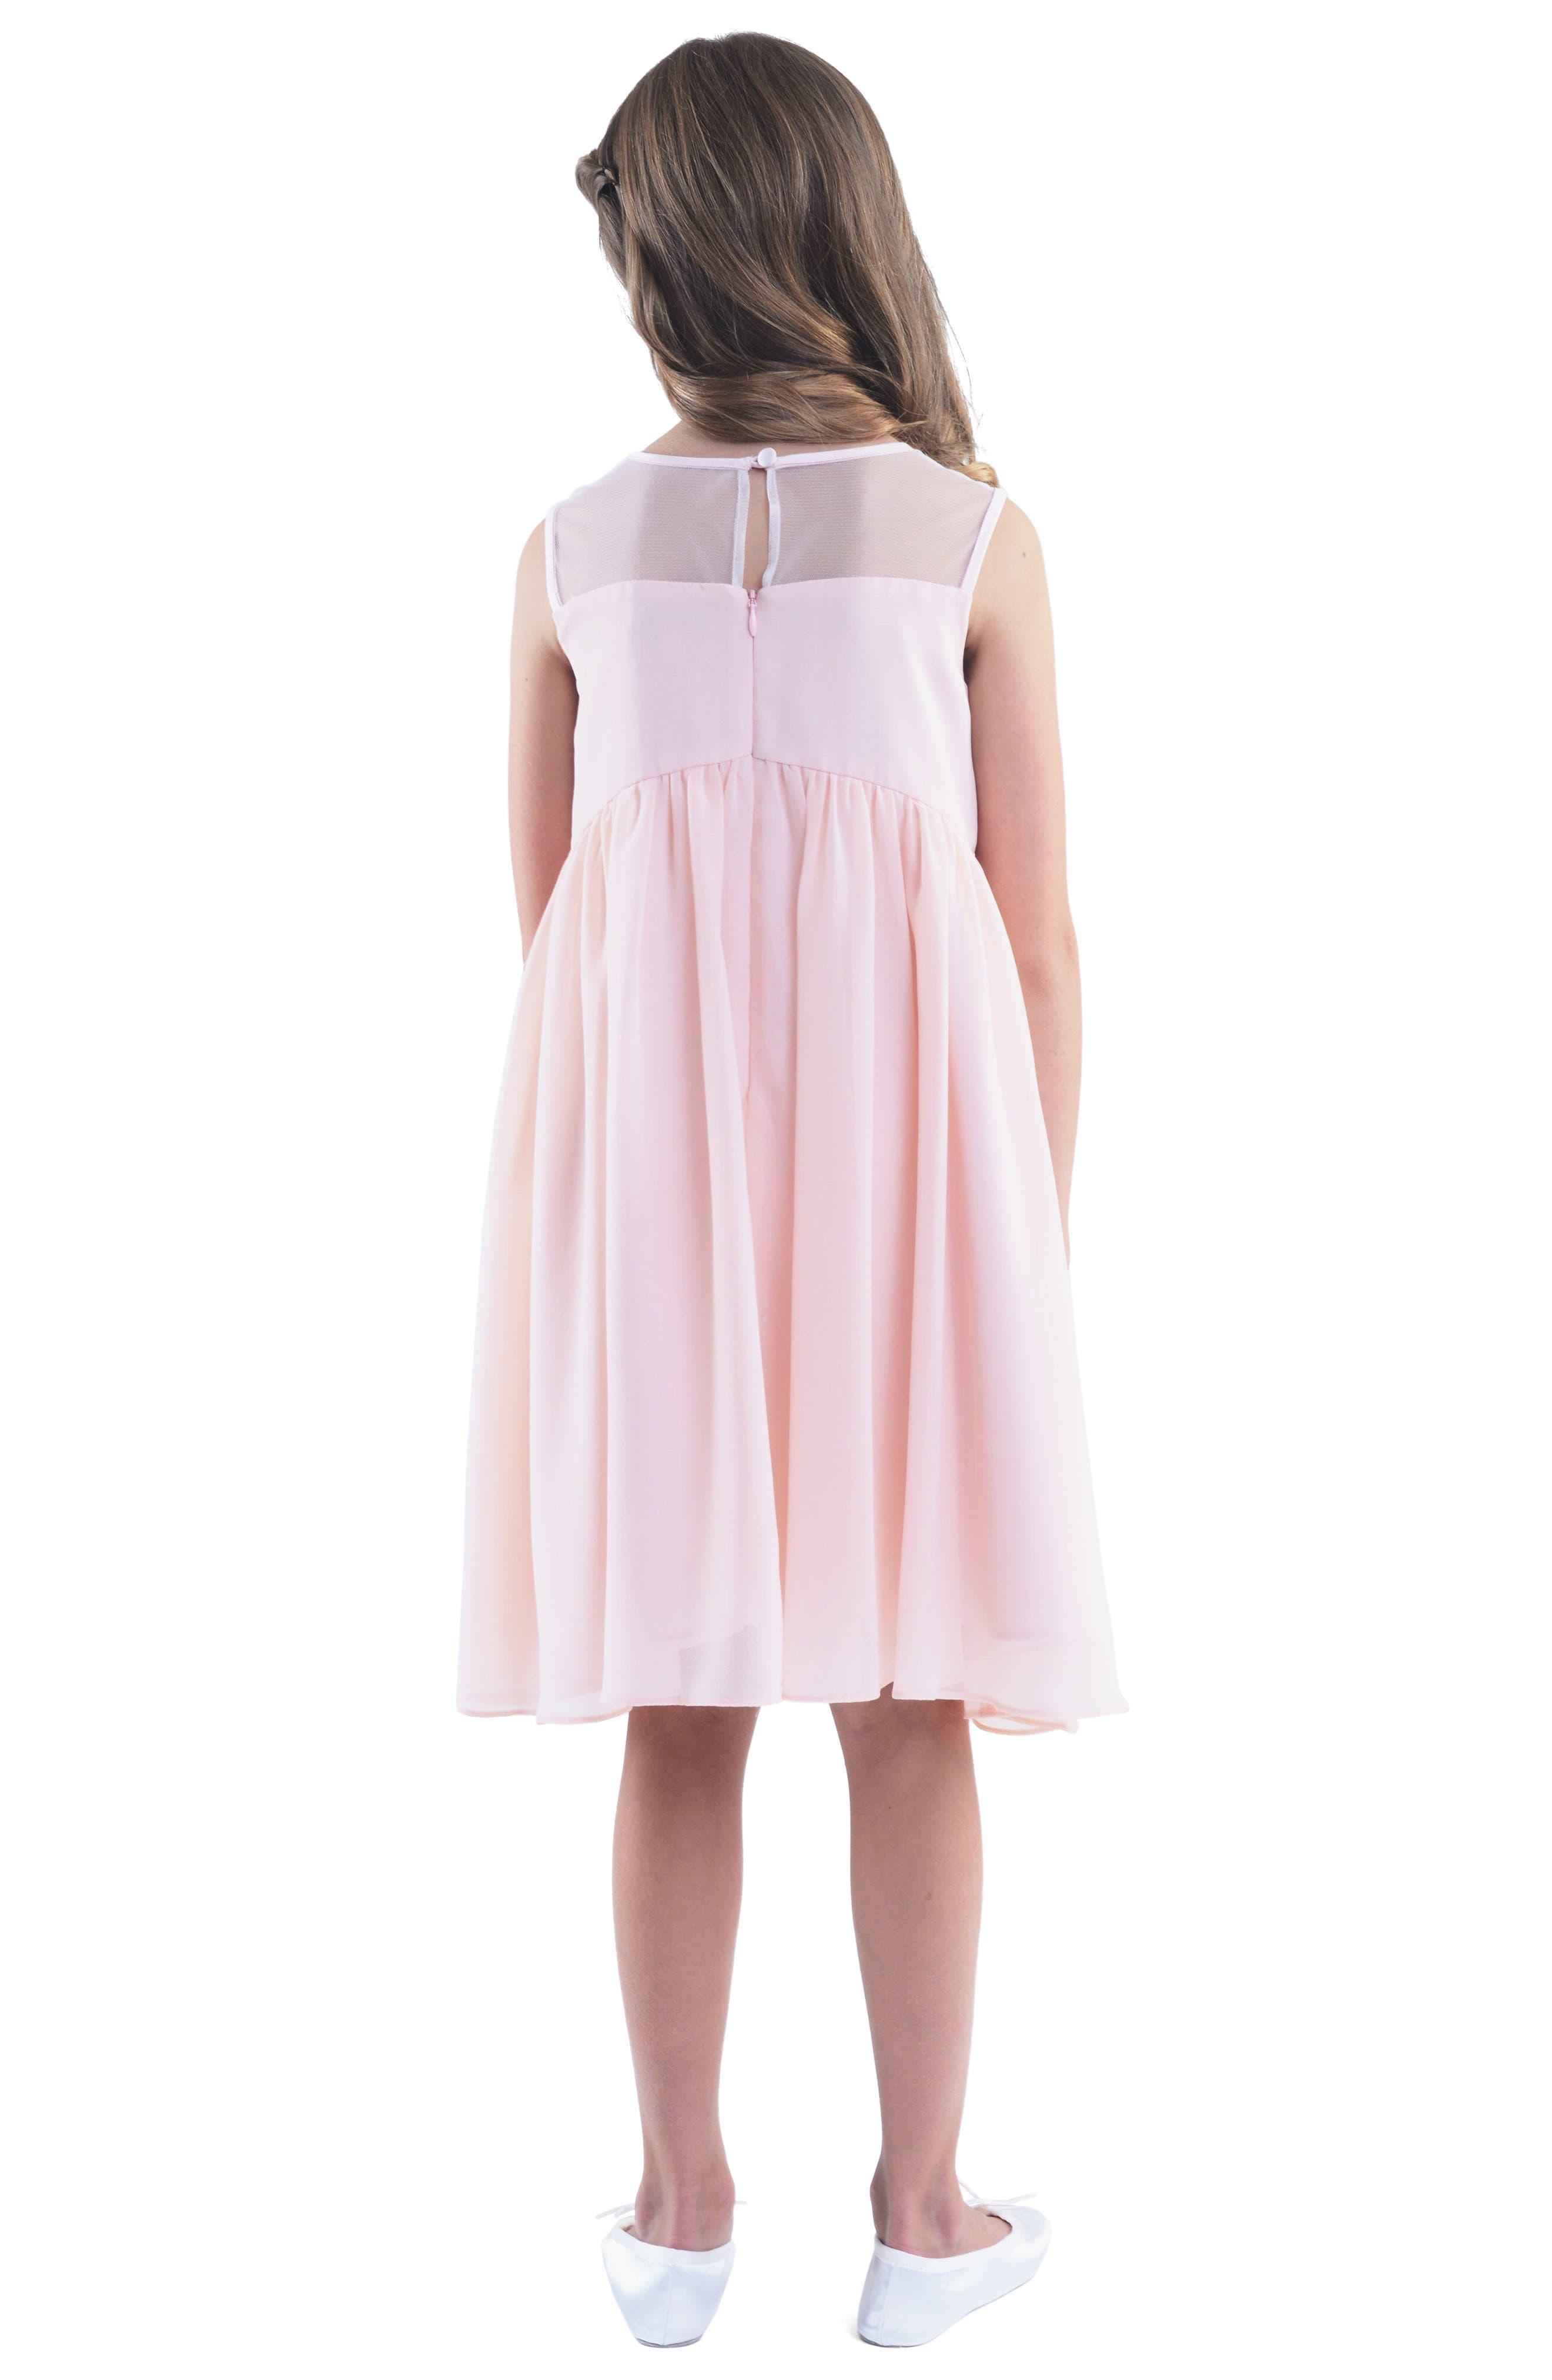 Illusion Neckline Dress,                             Alternate thumbnail 2, color,                             Blush Pink